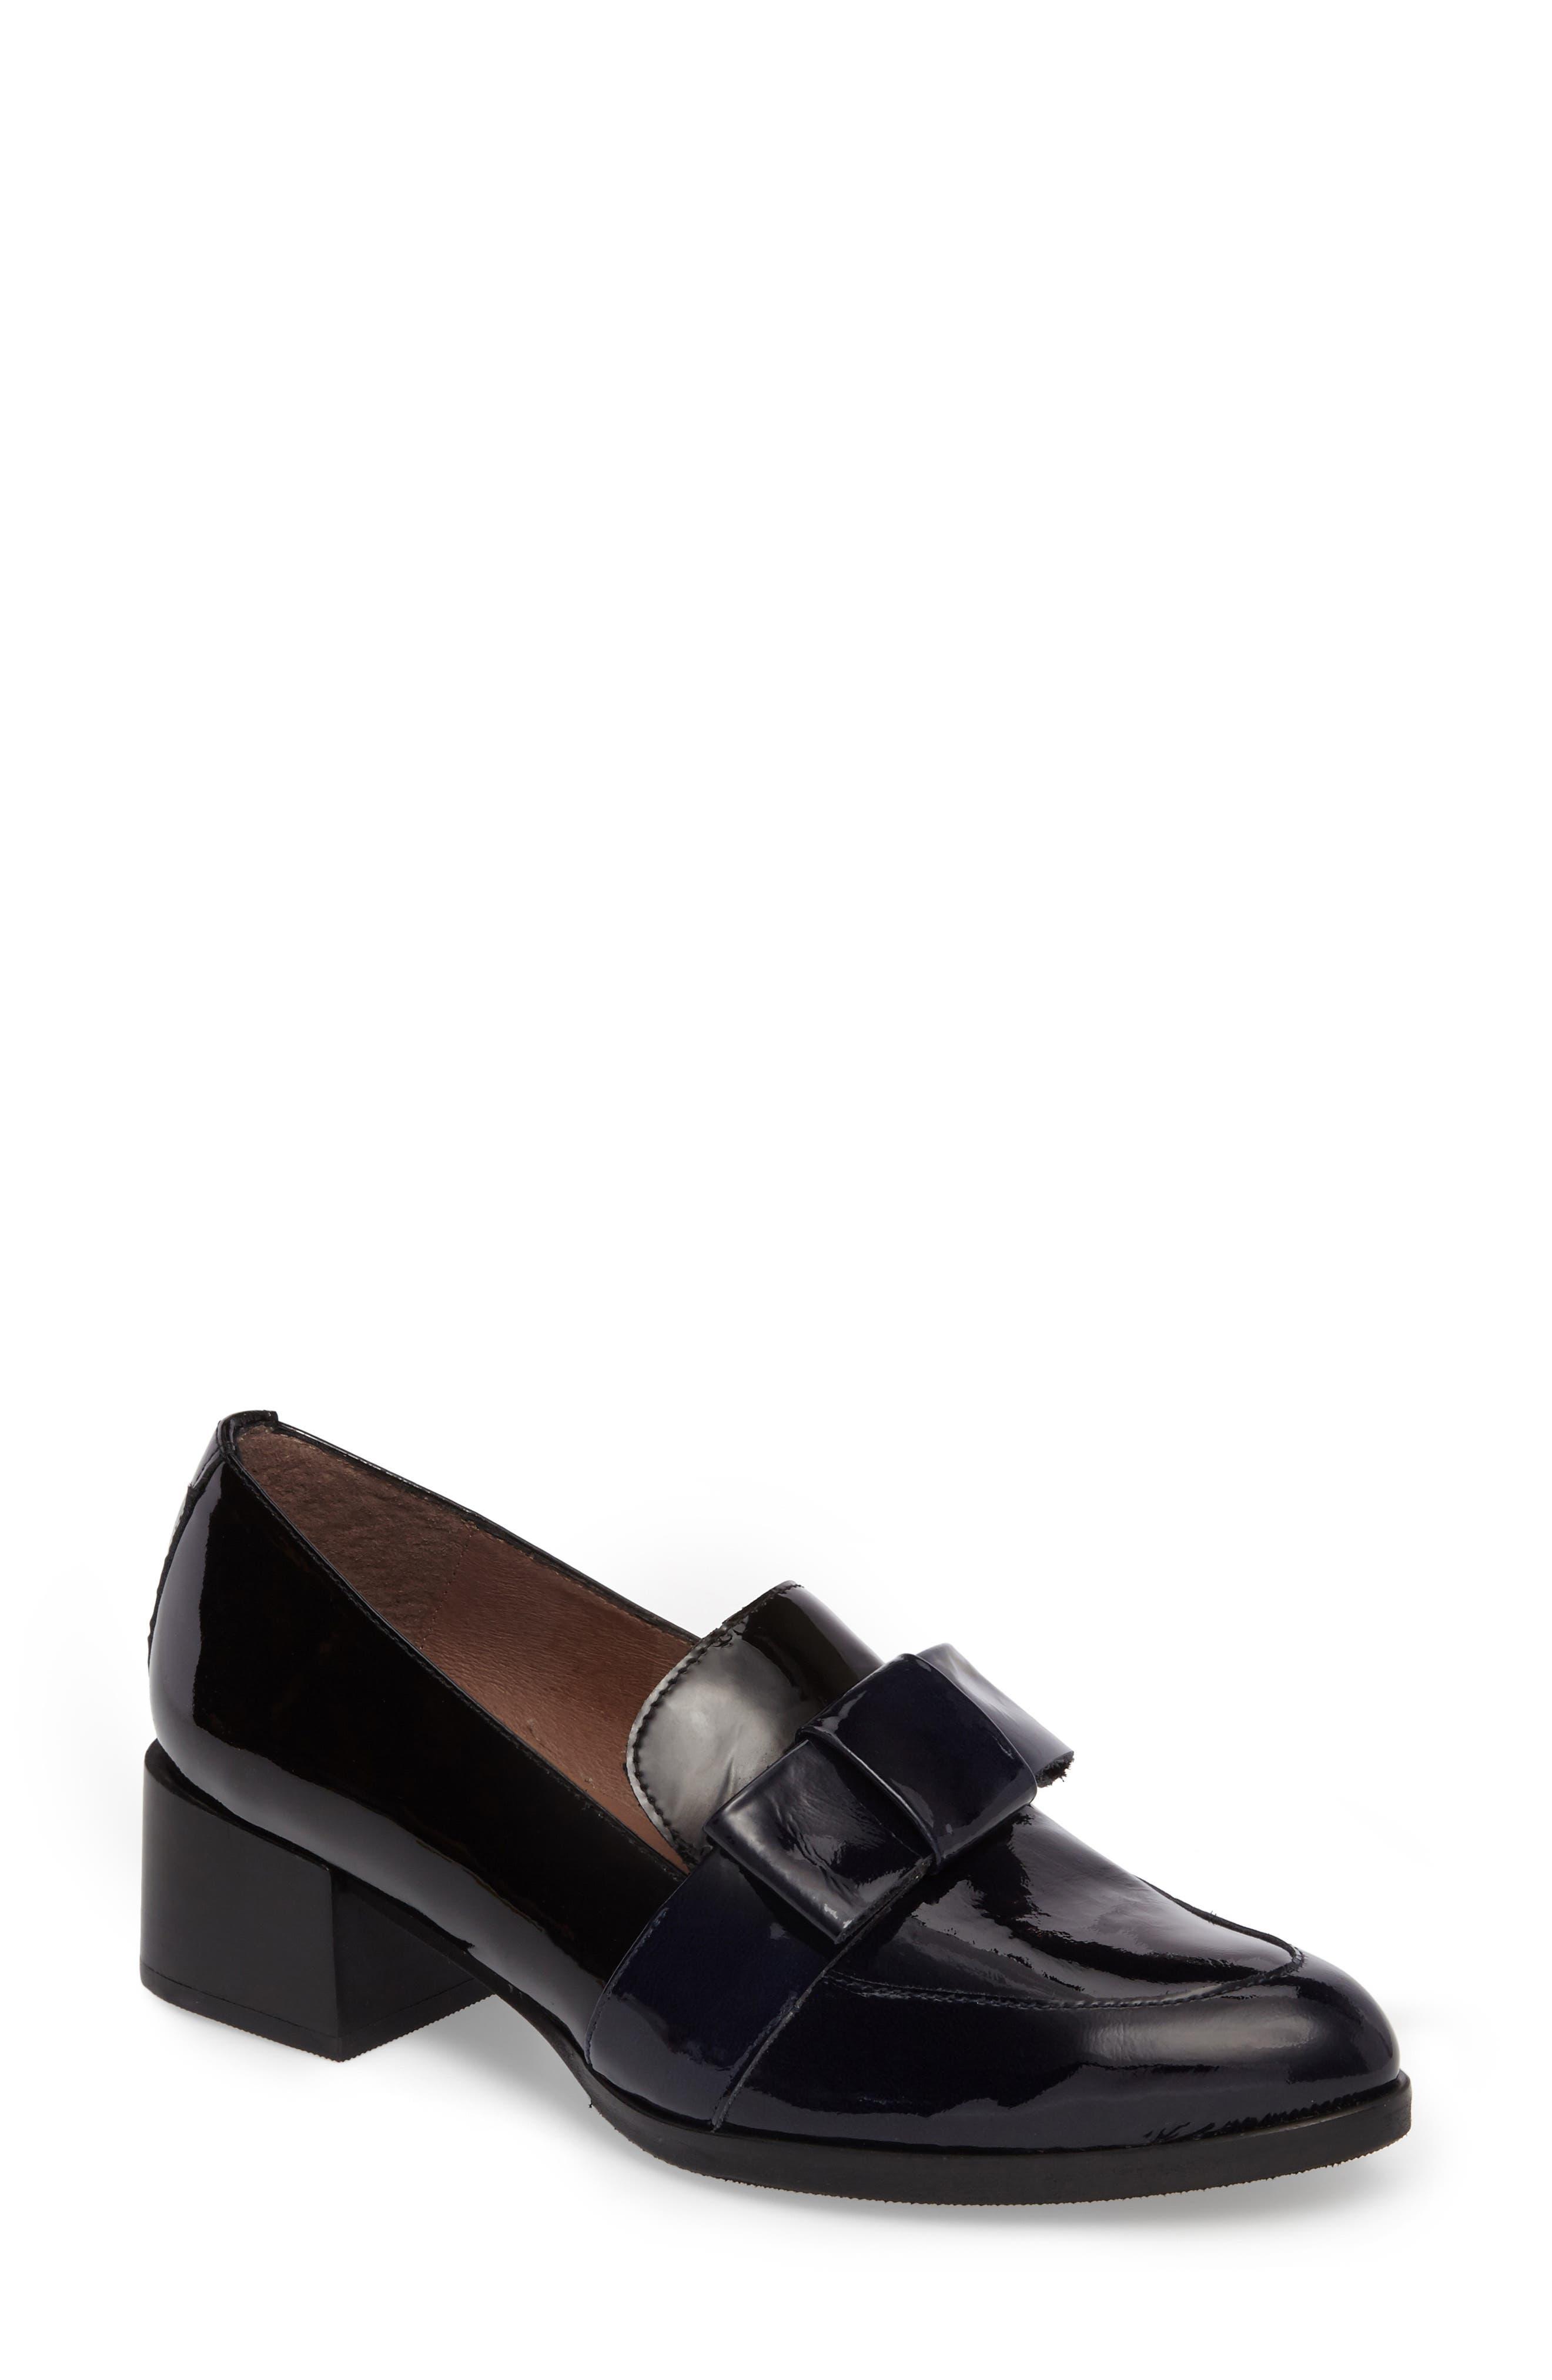 Block Heel Loafer Pump,                         Main,                         color, Navy/ Black Patent Leather